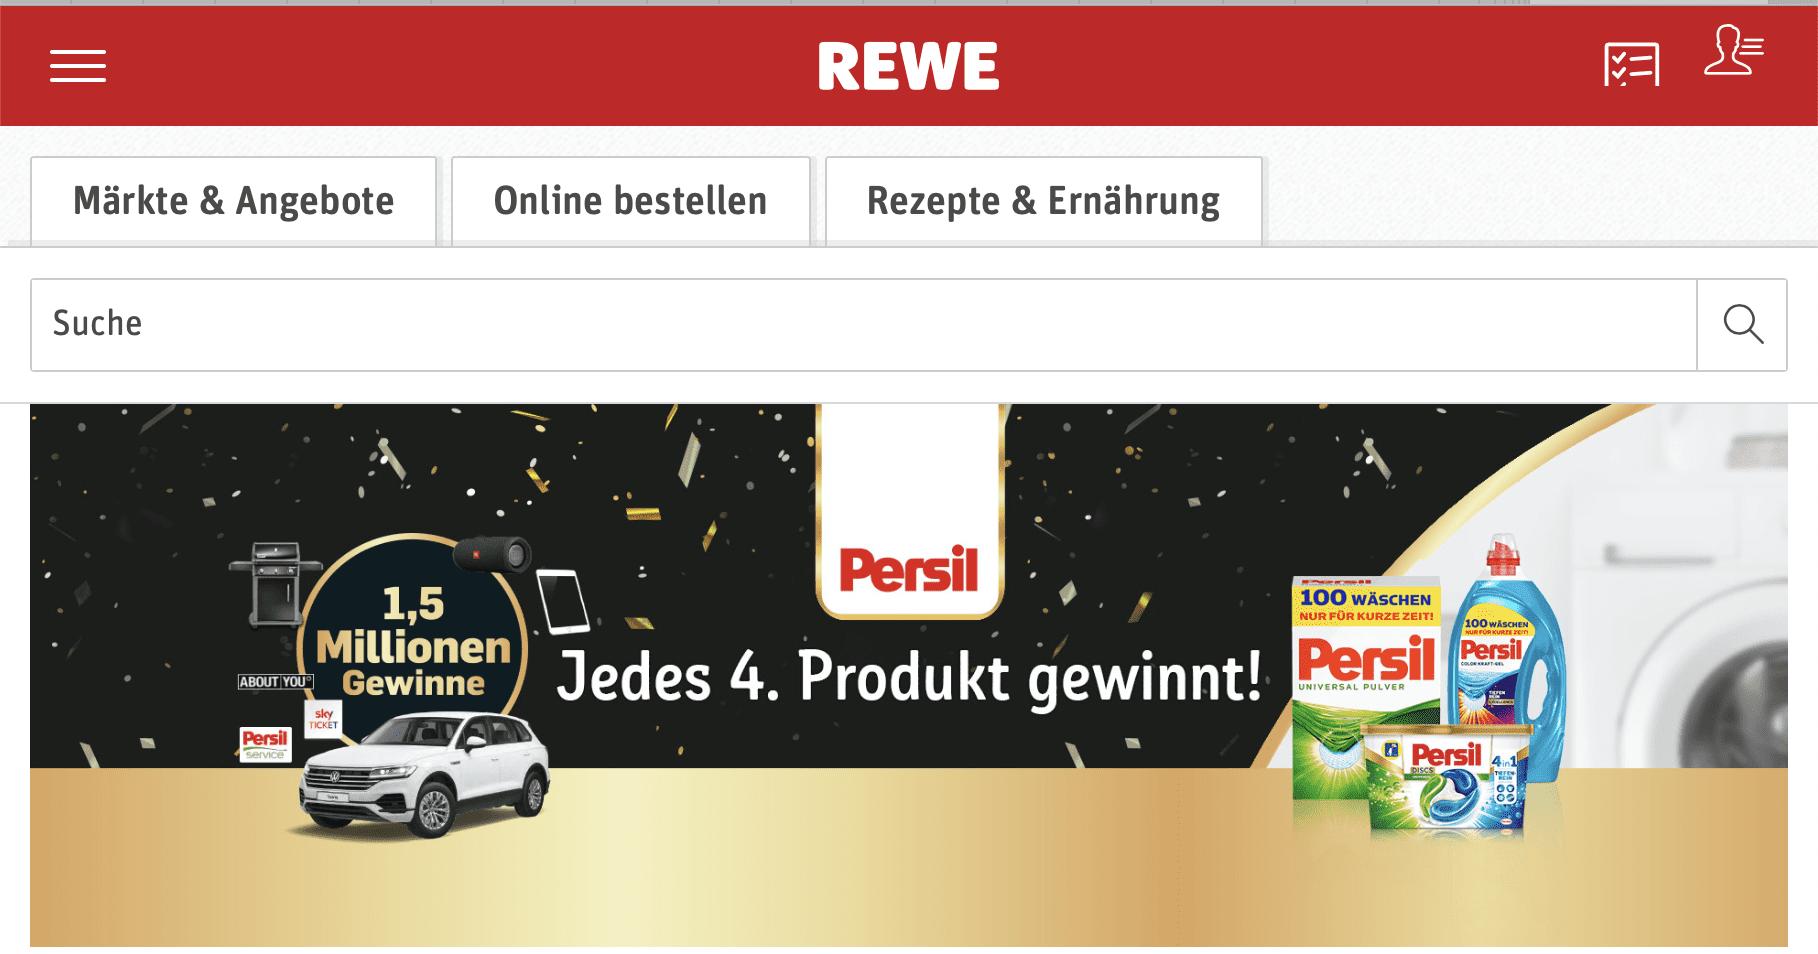 Persil Gewinnspiel-Cases FMCG Non Food